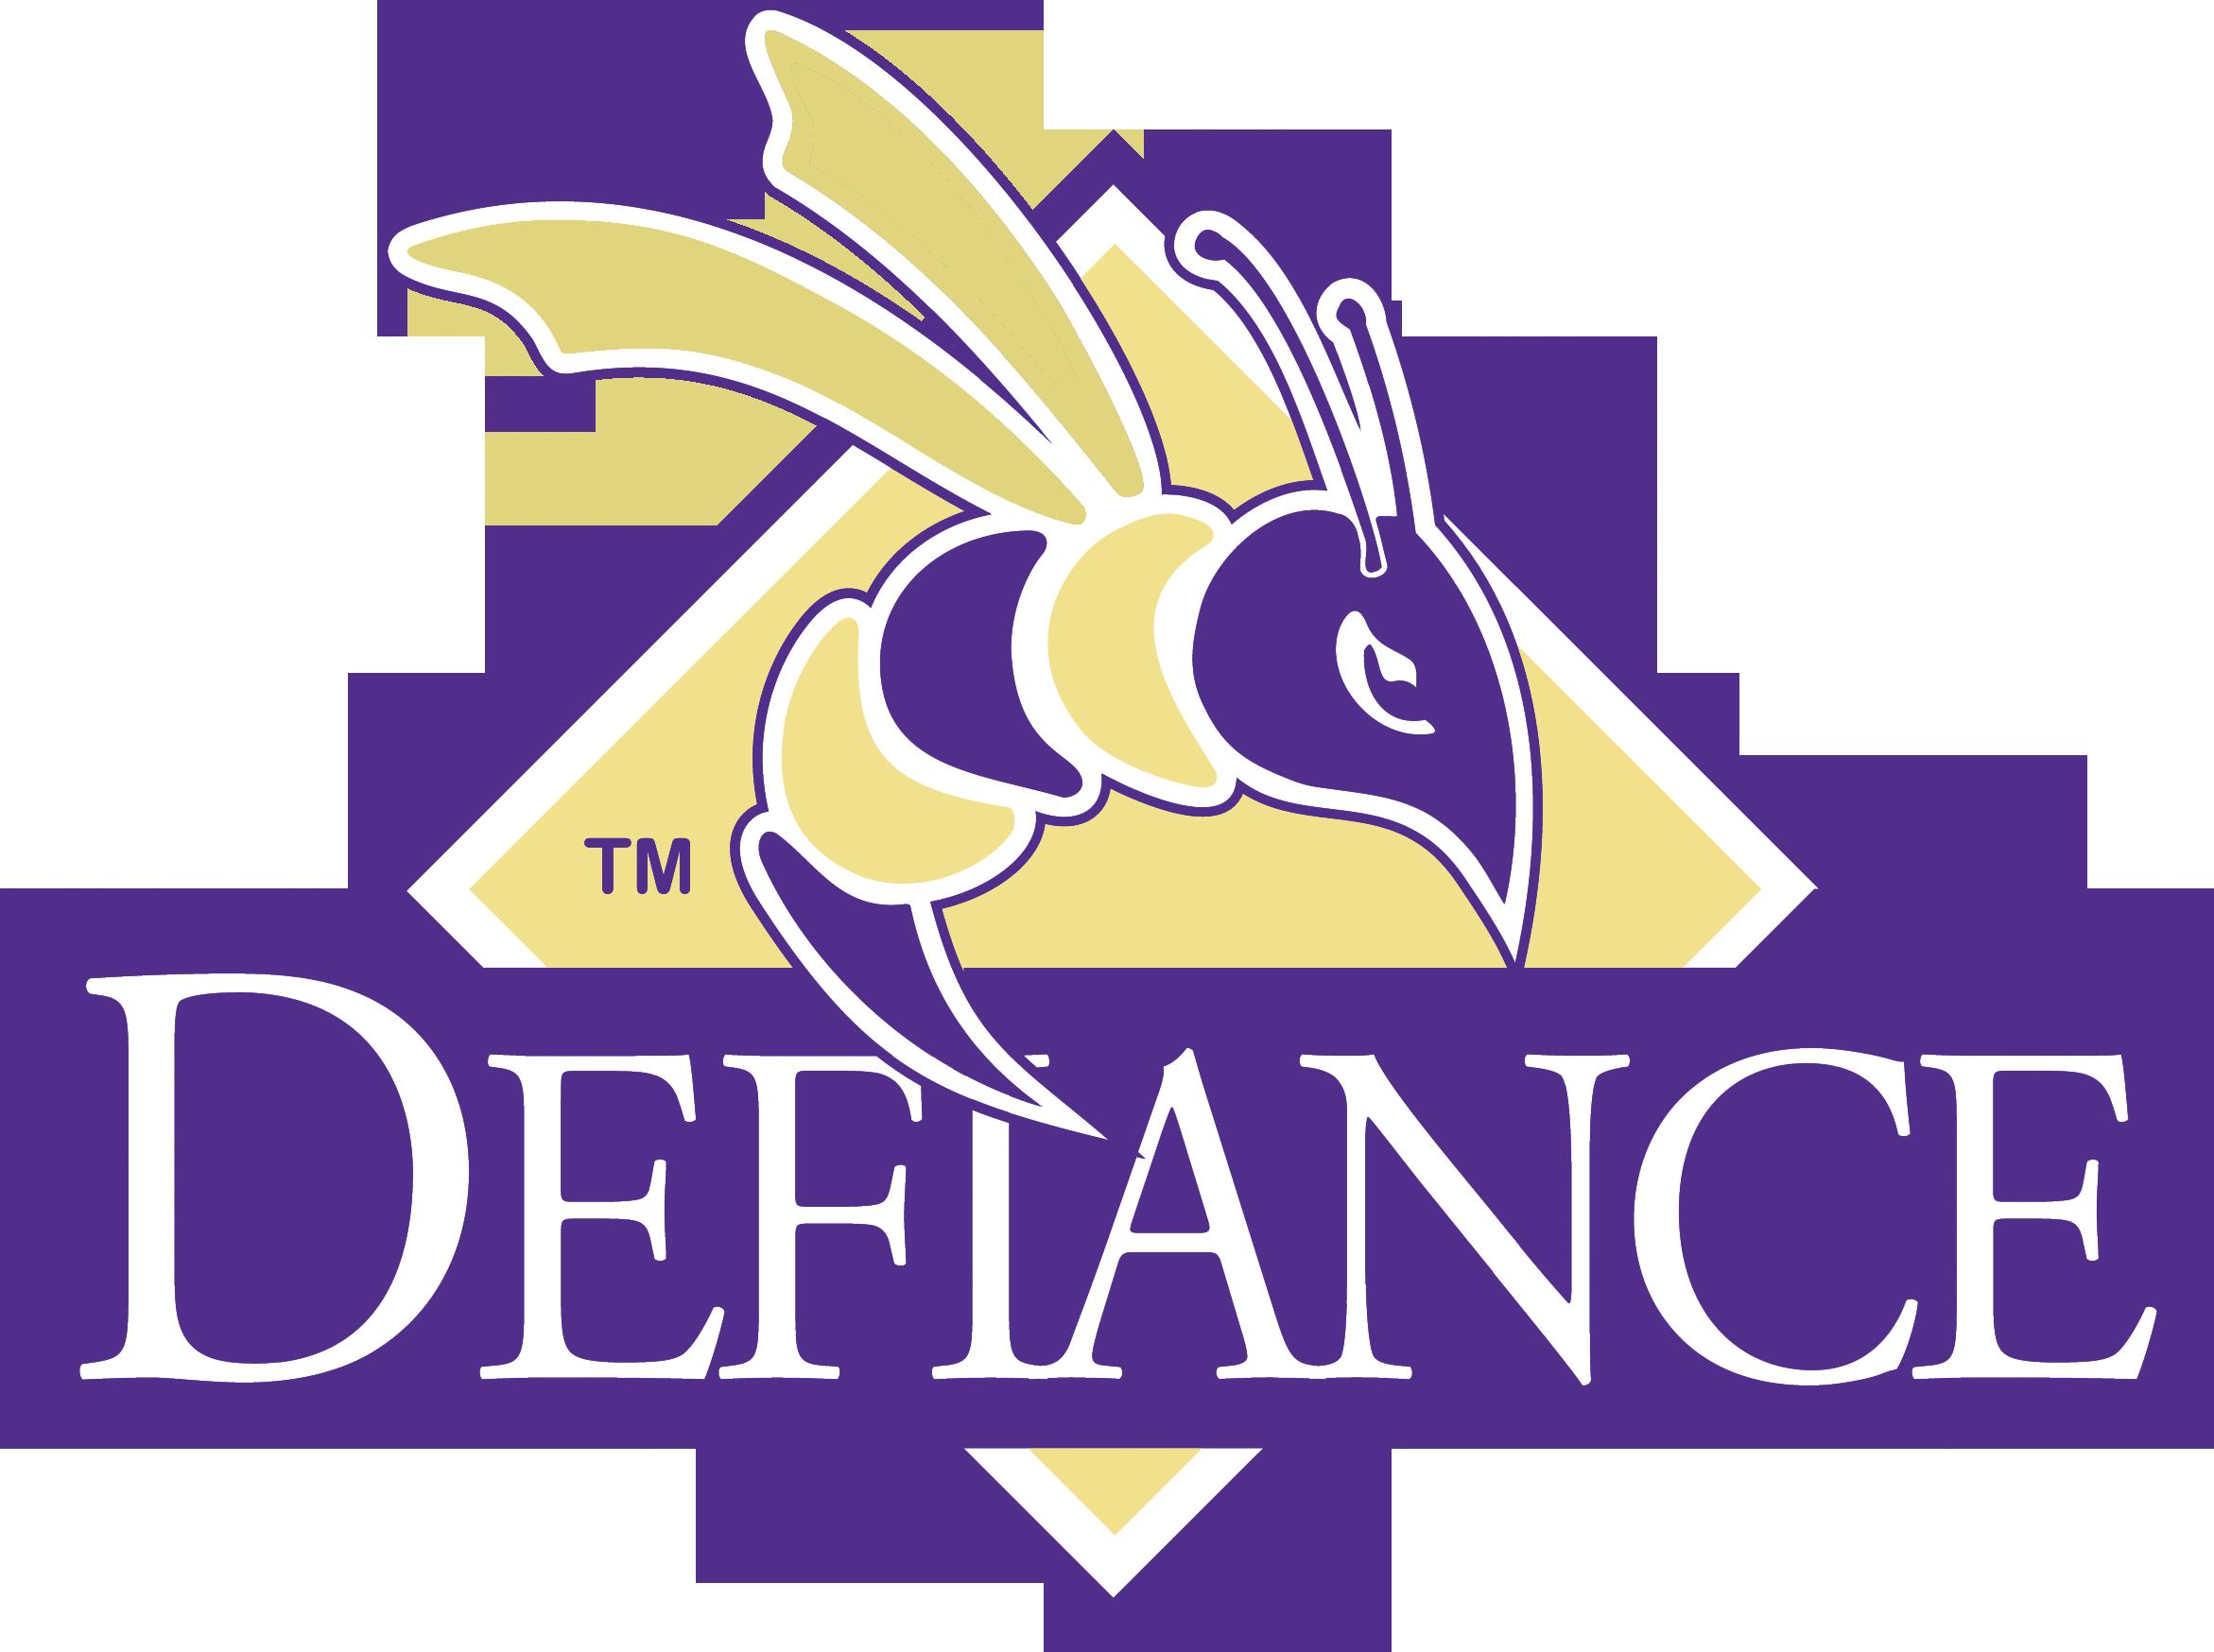 Yellow_Jacket_Defiance_Diamond.png